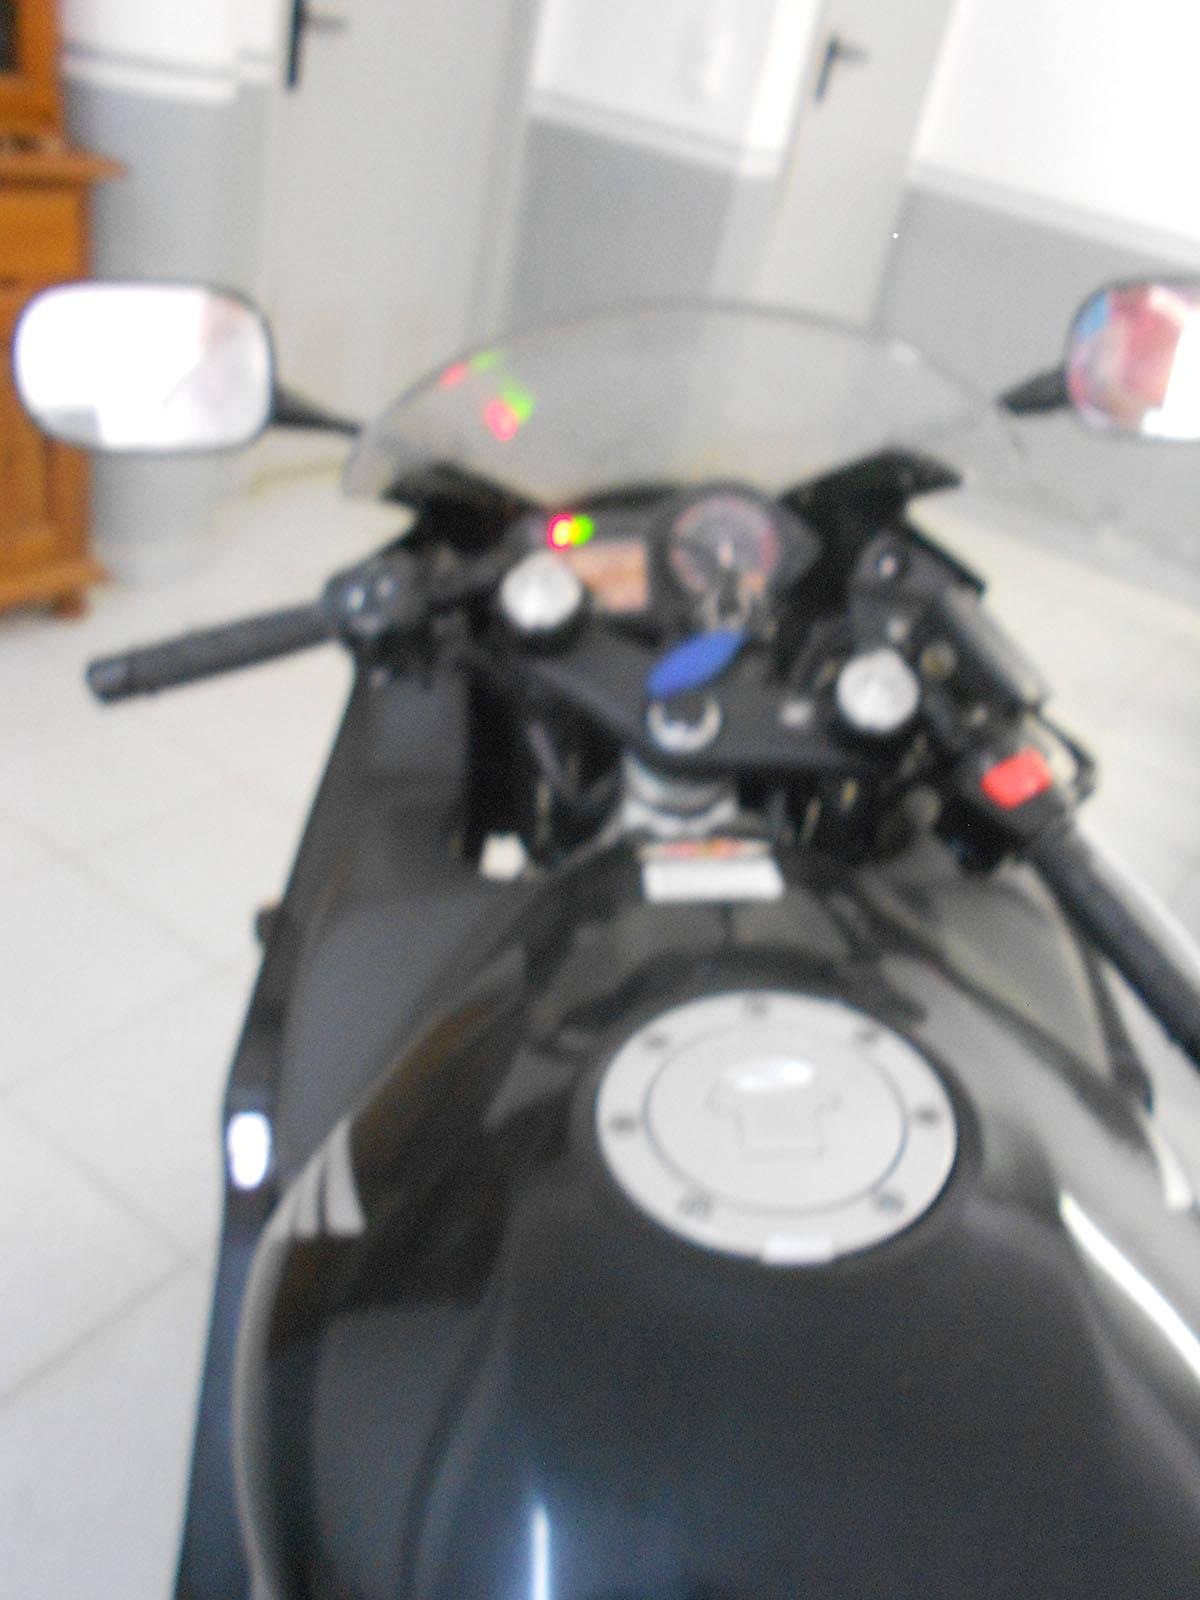 Honda CBR 600 F impecable 14.000kmts  - Foto 2